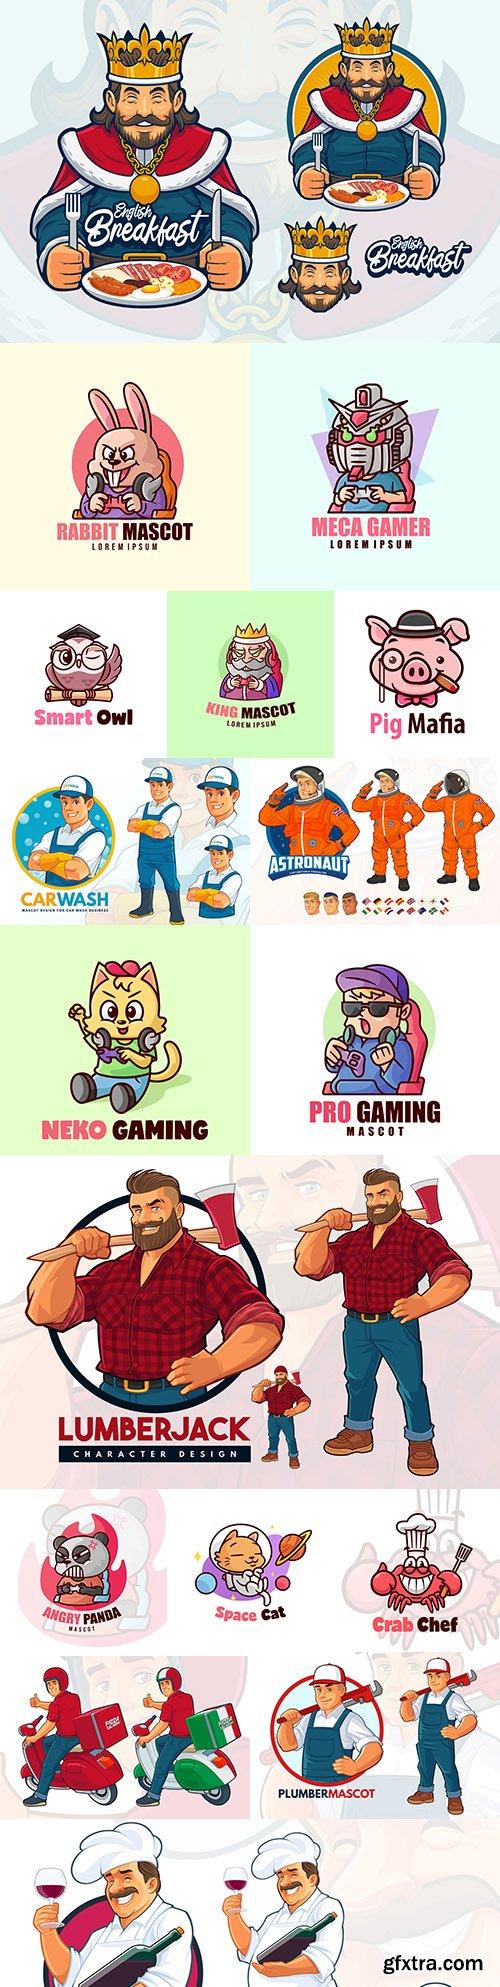 Emblem mascot and brand name logos design 30